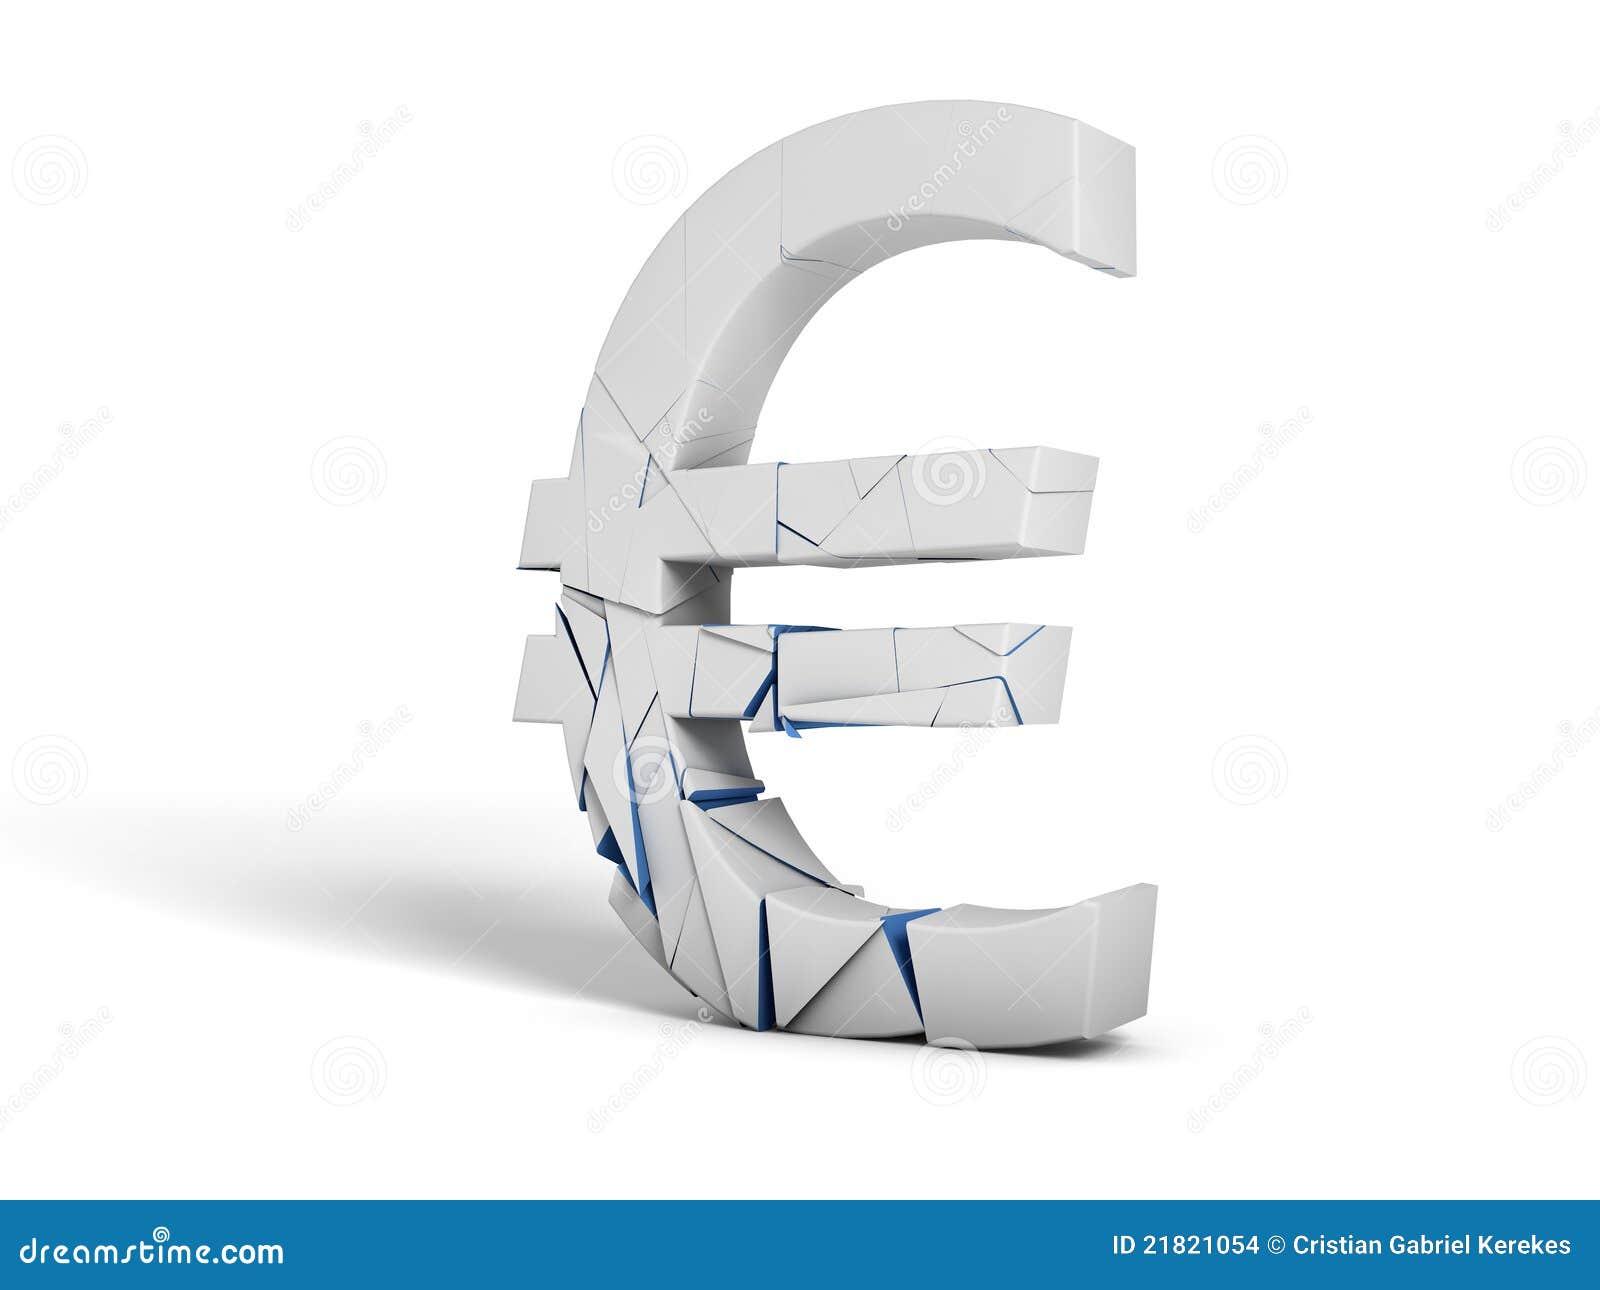 Shattered euro symbol